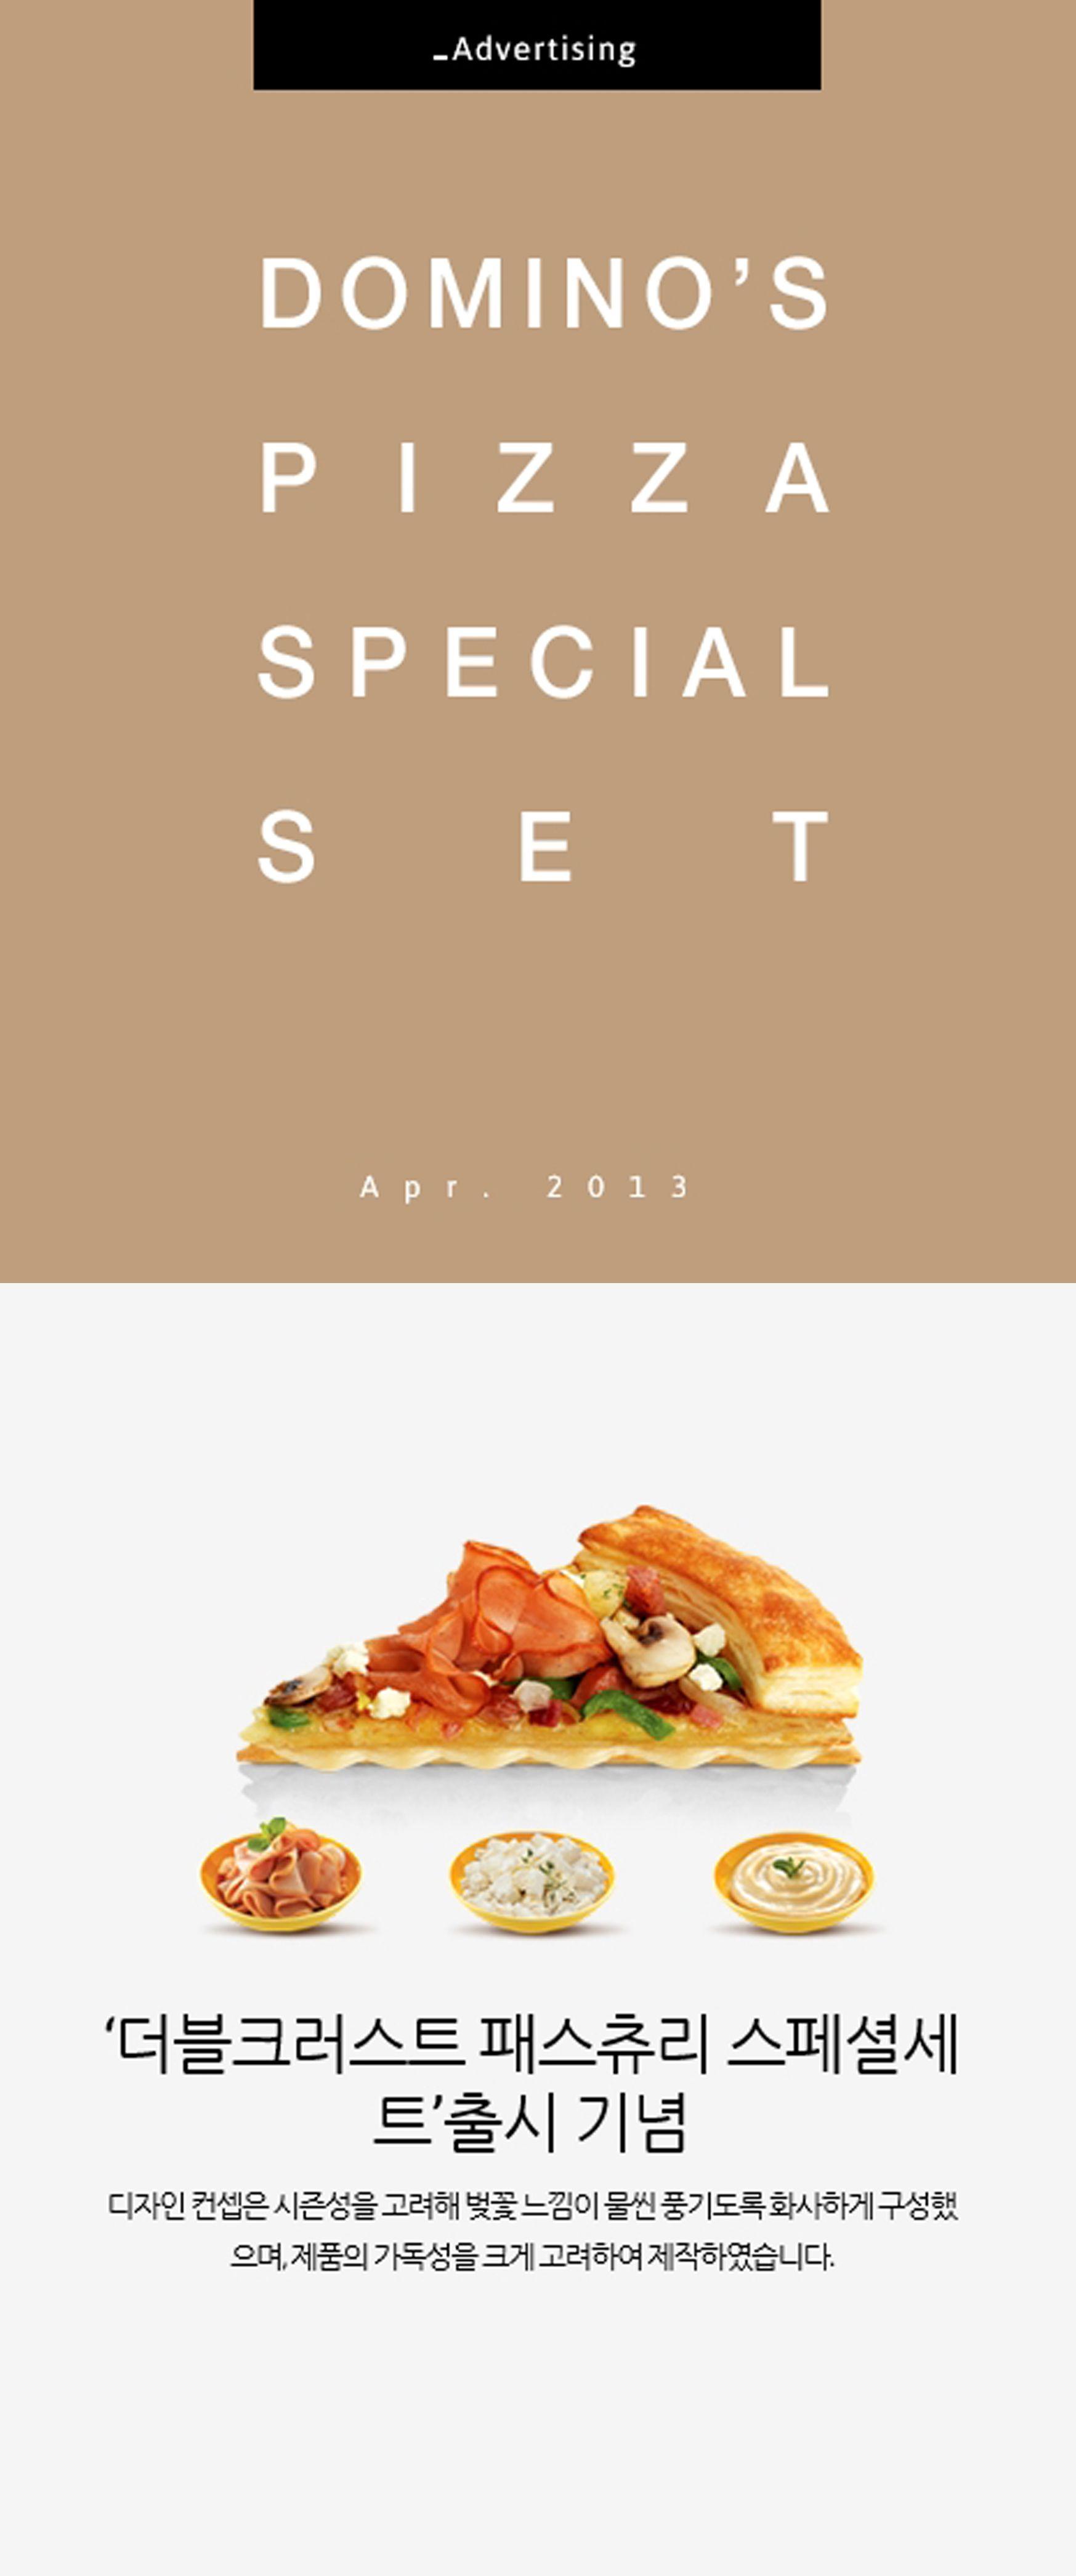 [digitalDigm_Work]- digitalDigm opened microsite of Domino's Pizza to celebrate its launching 'Double Crust Pastry Pizza Special Set'.